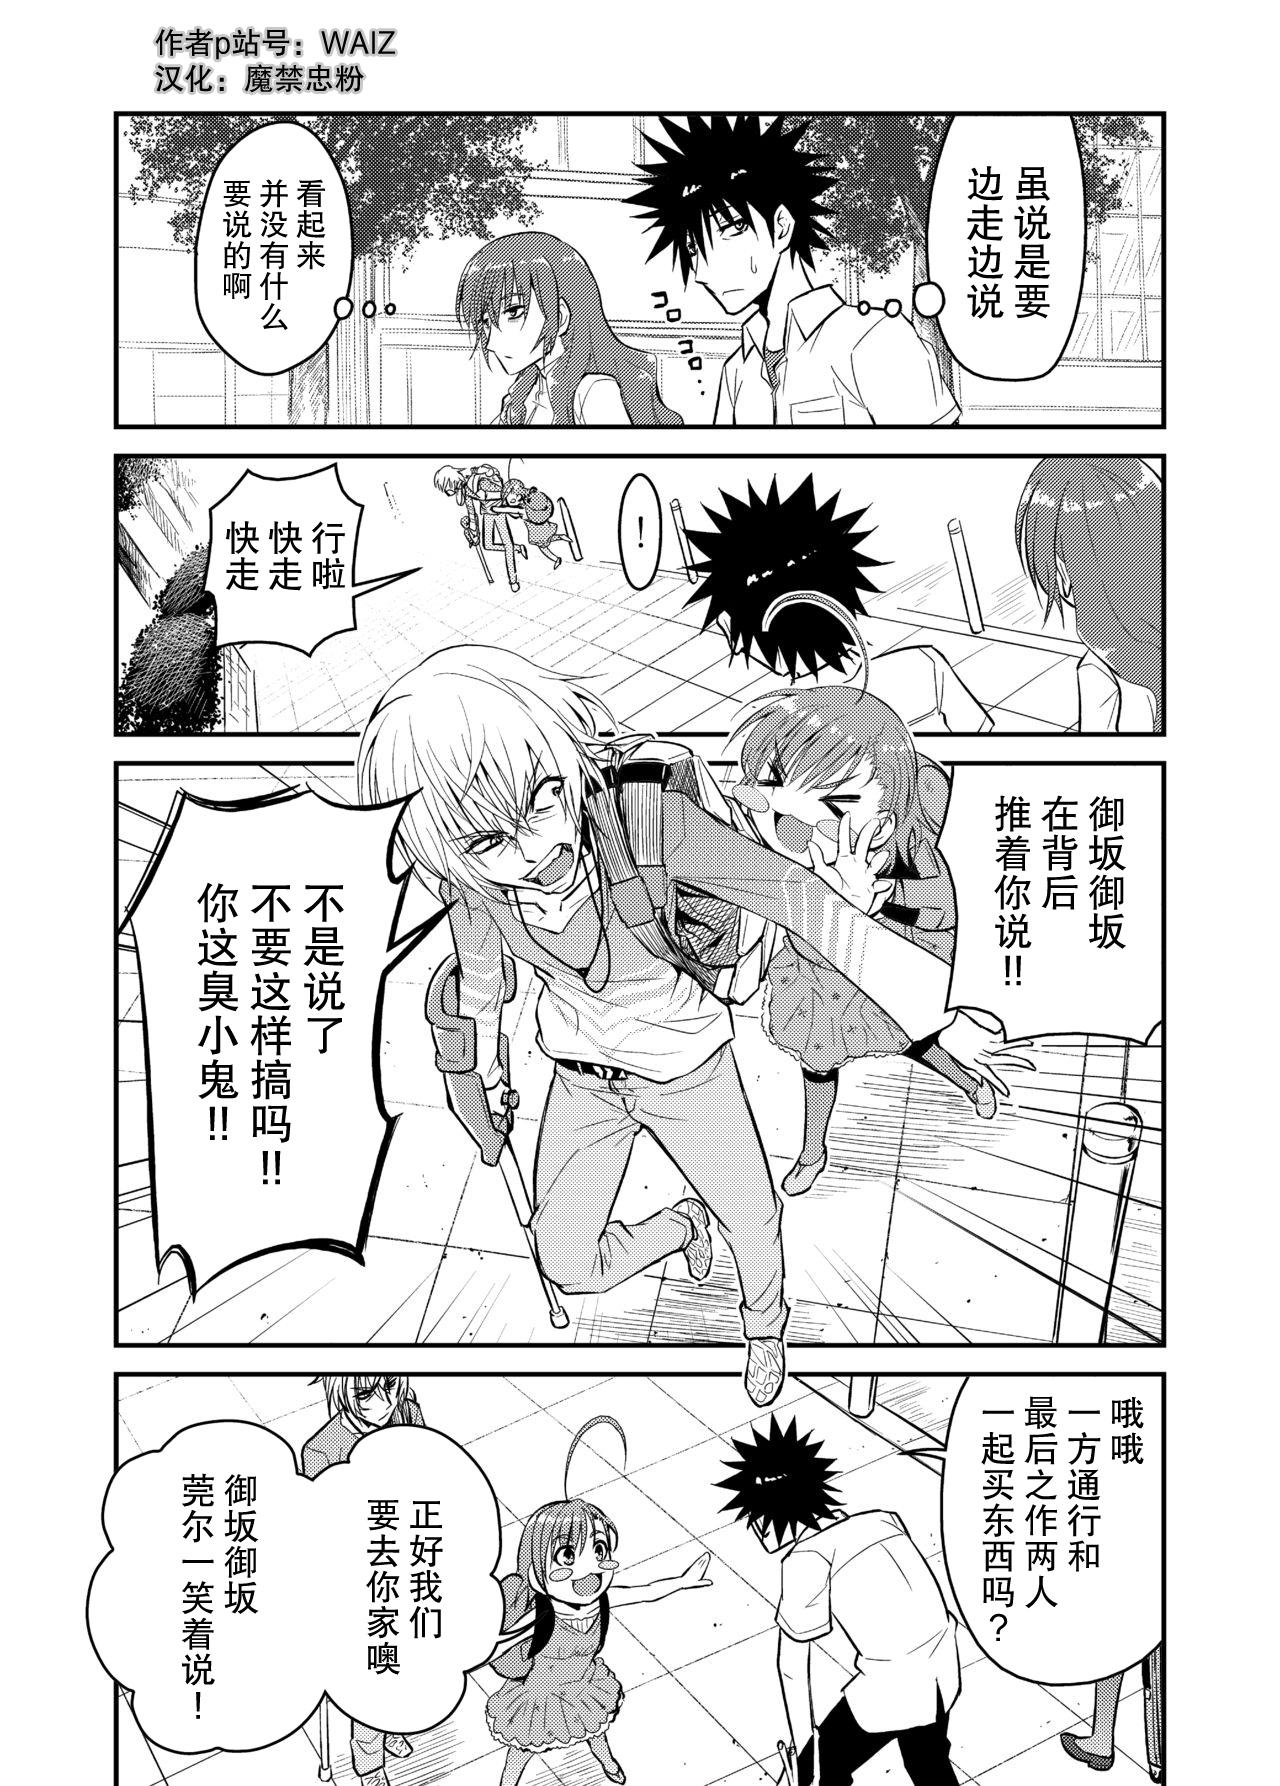 [WAIZ][同人个人渣汉化][就算是上条先生我家要住7个人还是太勉强了](Toaru Majutsu no Index) [中国翻译] 19